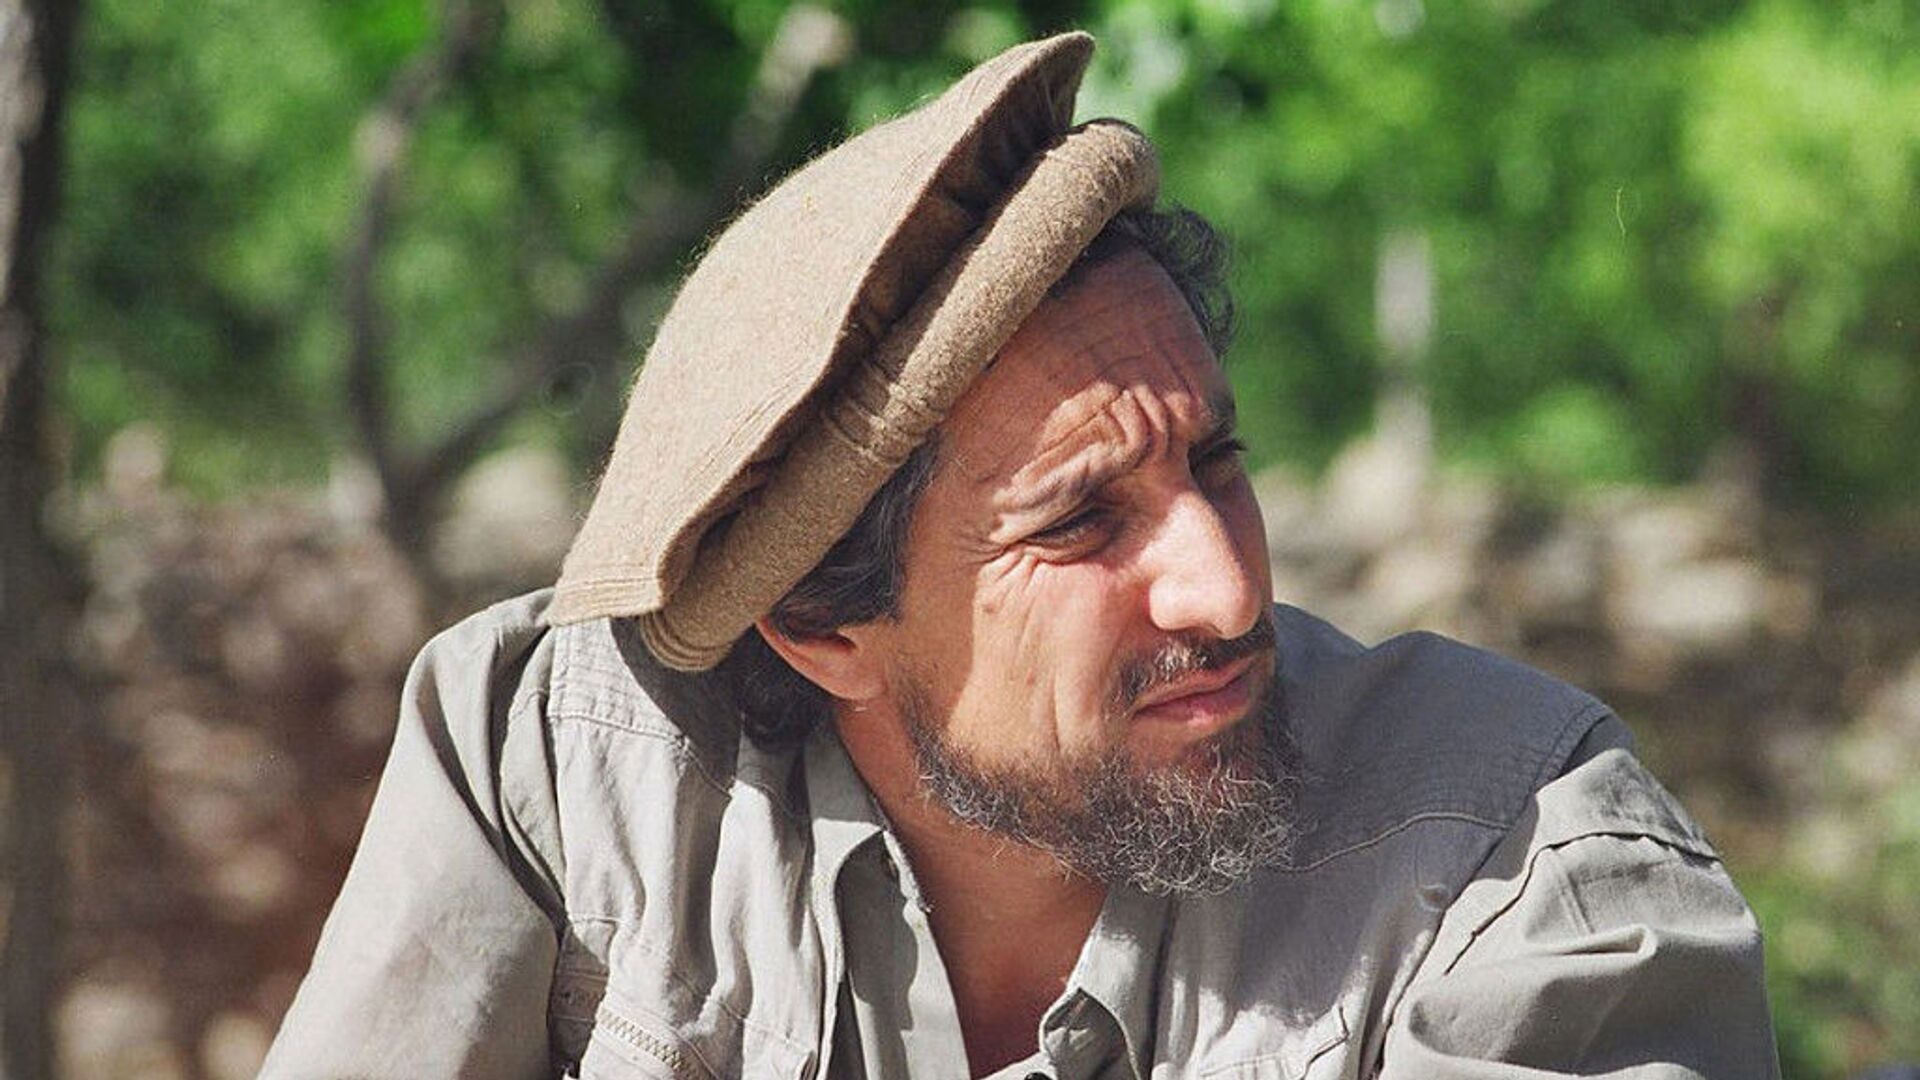 Ахмад Шах Масуд - Sputnik Таджикистан, 1920, 07.09.2021